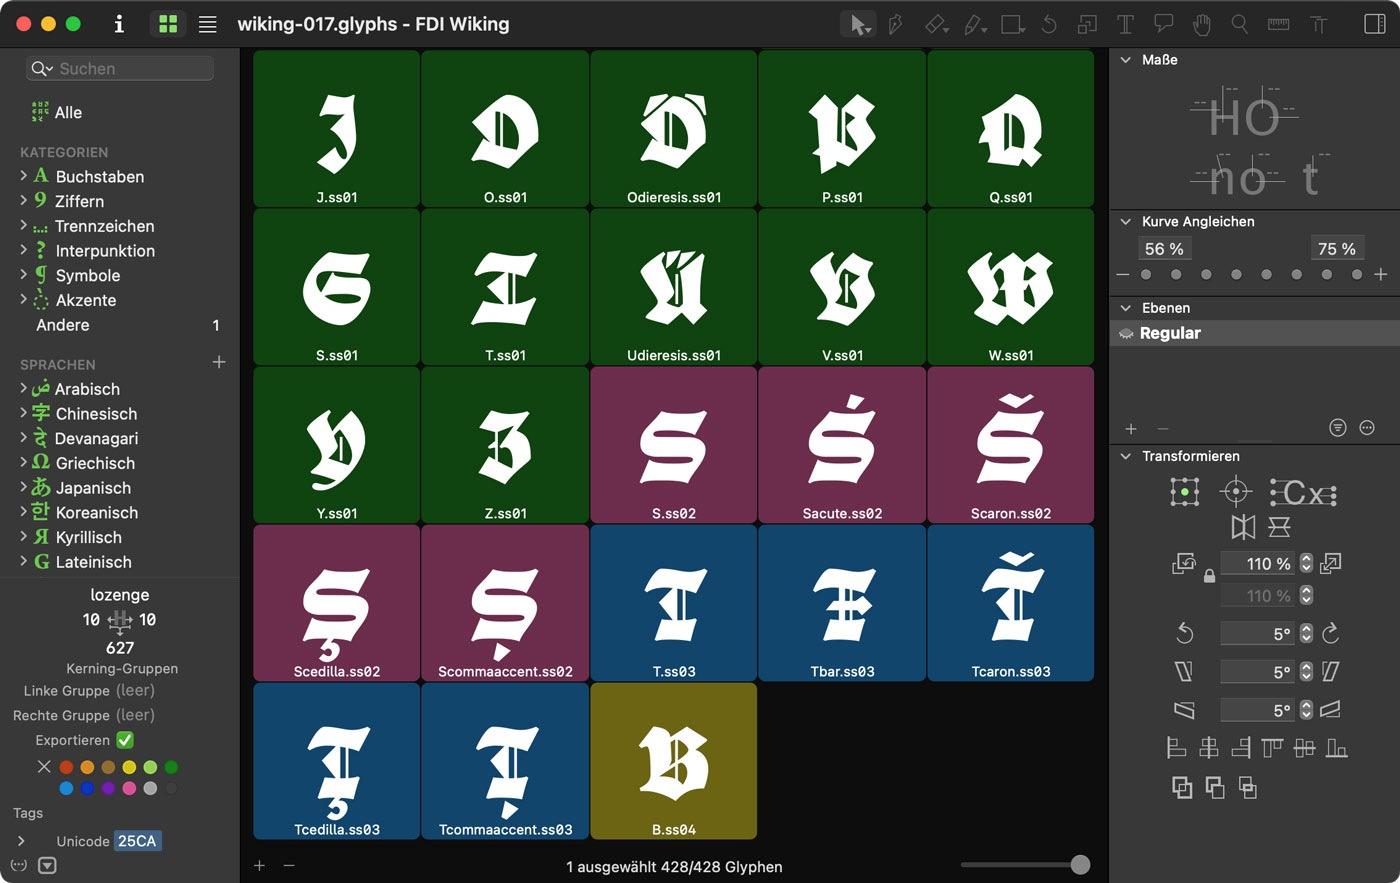 glyphs3.jpg.c043a0aa70e379c8b8e9f4acd30e9966.jpg